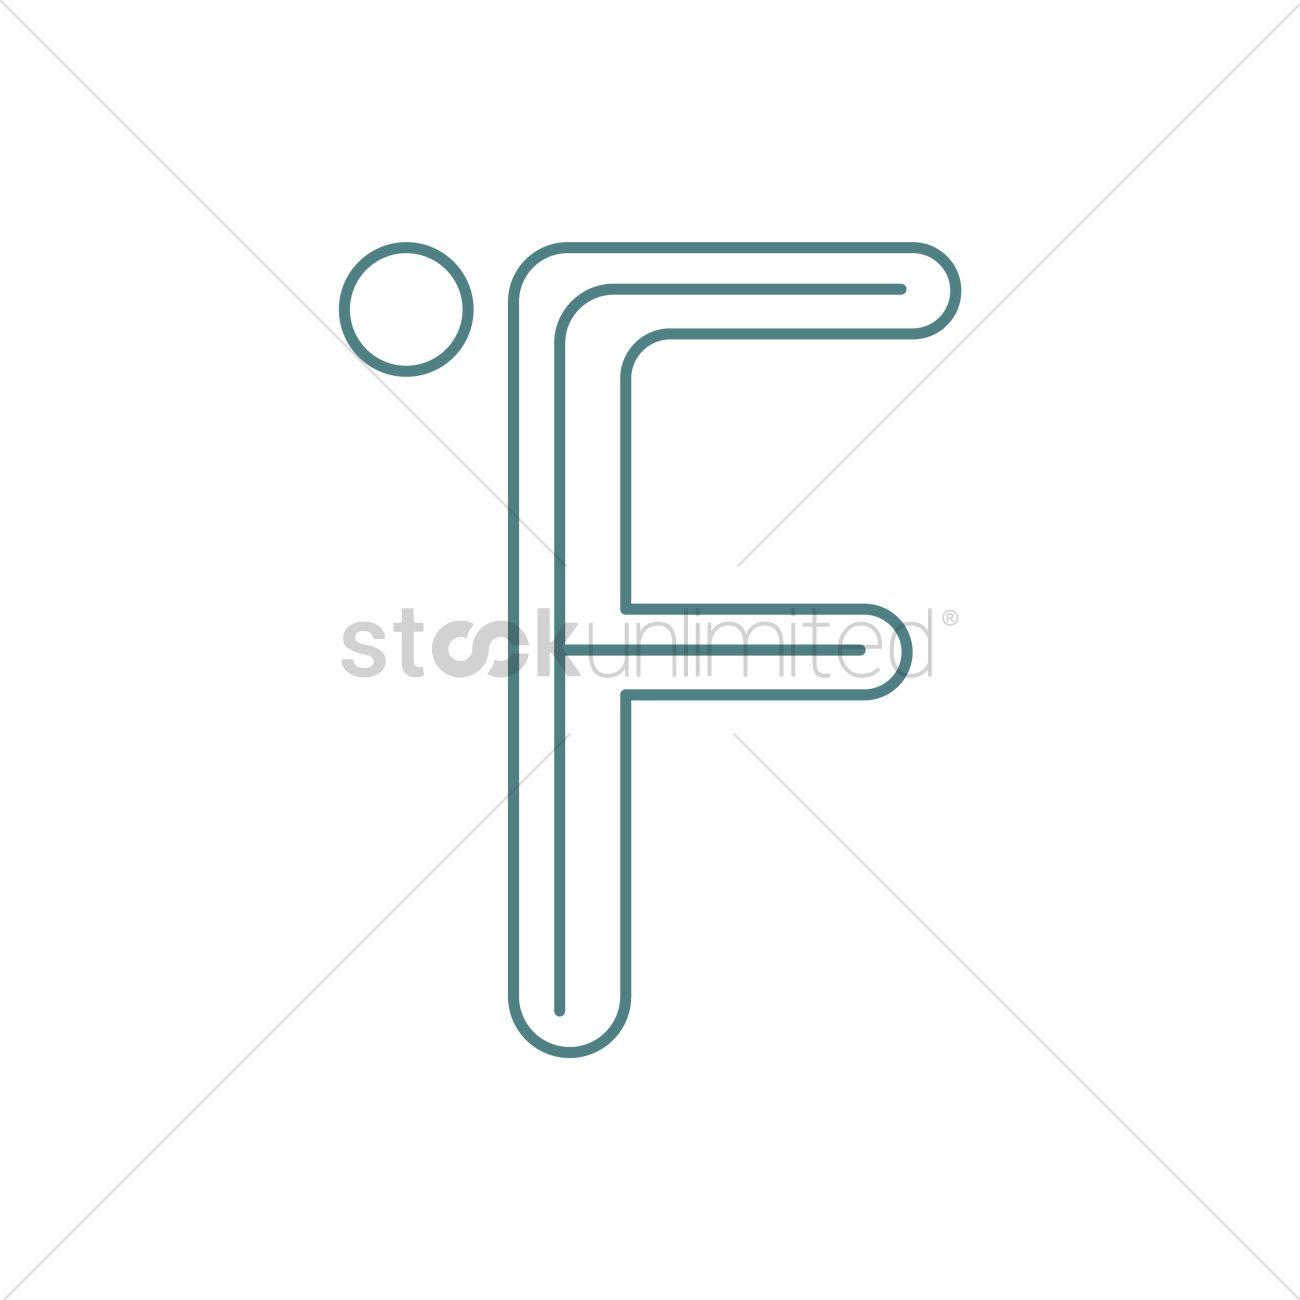 Fahrenheit symbol vector image 1364879 stockunlimited fahrenheit symbol vector graphic biocorpaavc Choice Image